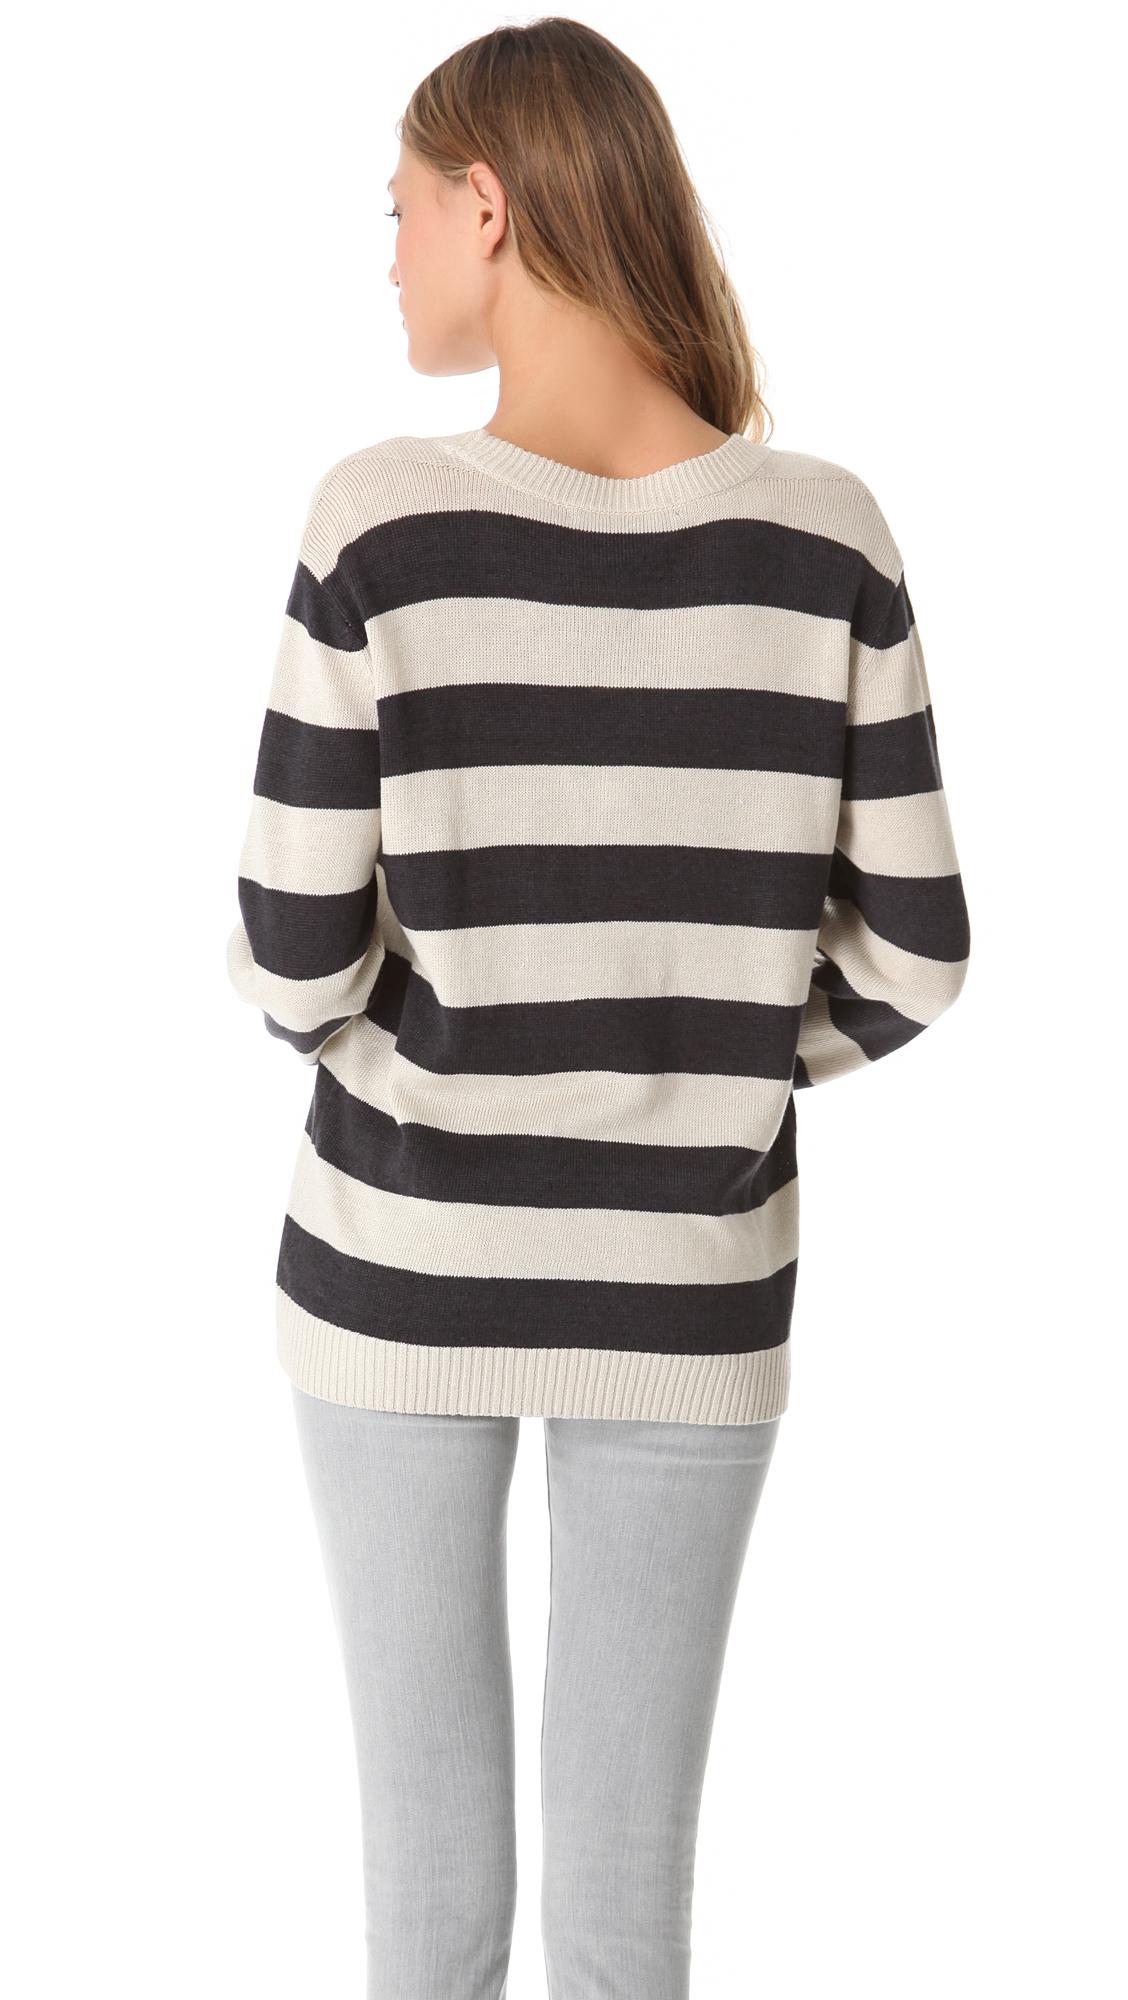 marc by marc jacobs winnie striped sweater in black bone lyst. Black Bedroom Furniture Sets. Home Design Ideas